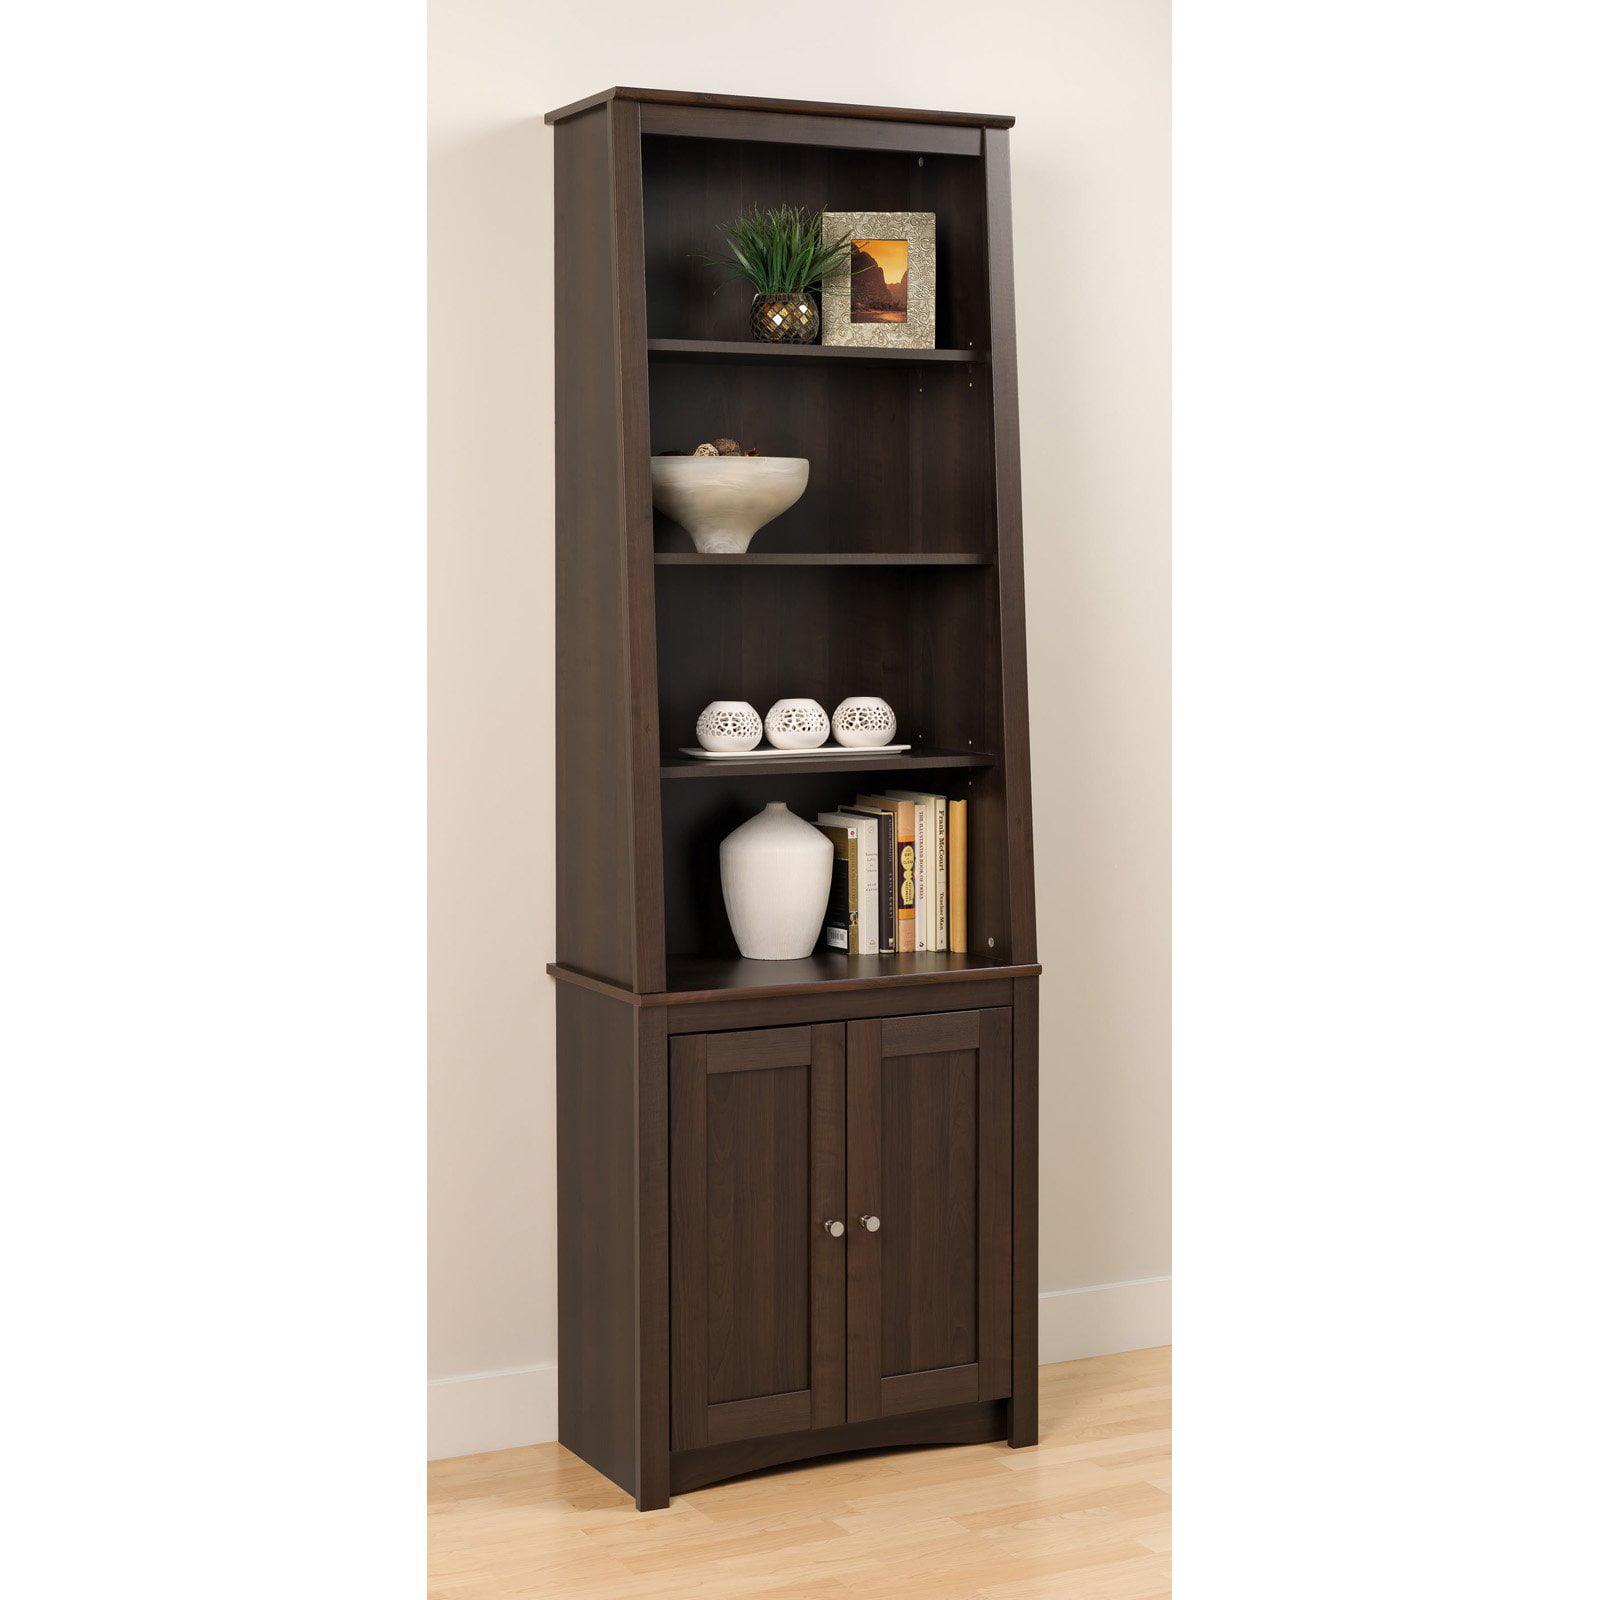 Prepac 6-Shelf Slant Back Bookcase with Doors, Espresso by Prepac Manufacturing Ltd